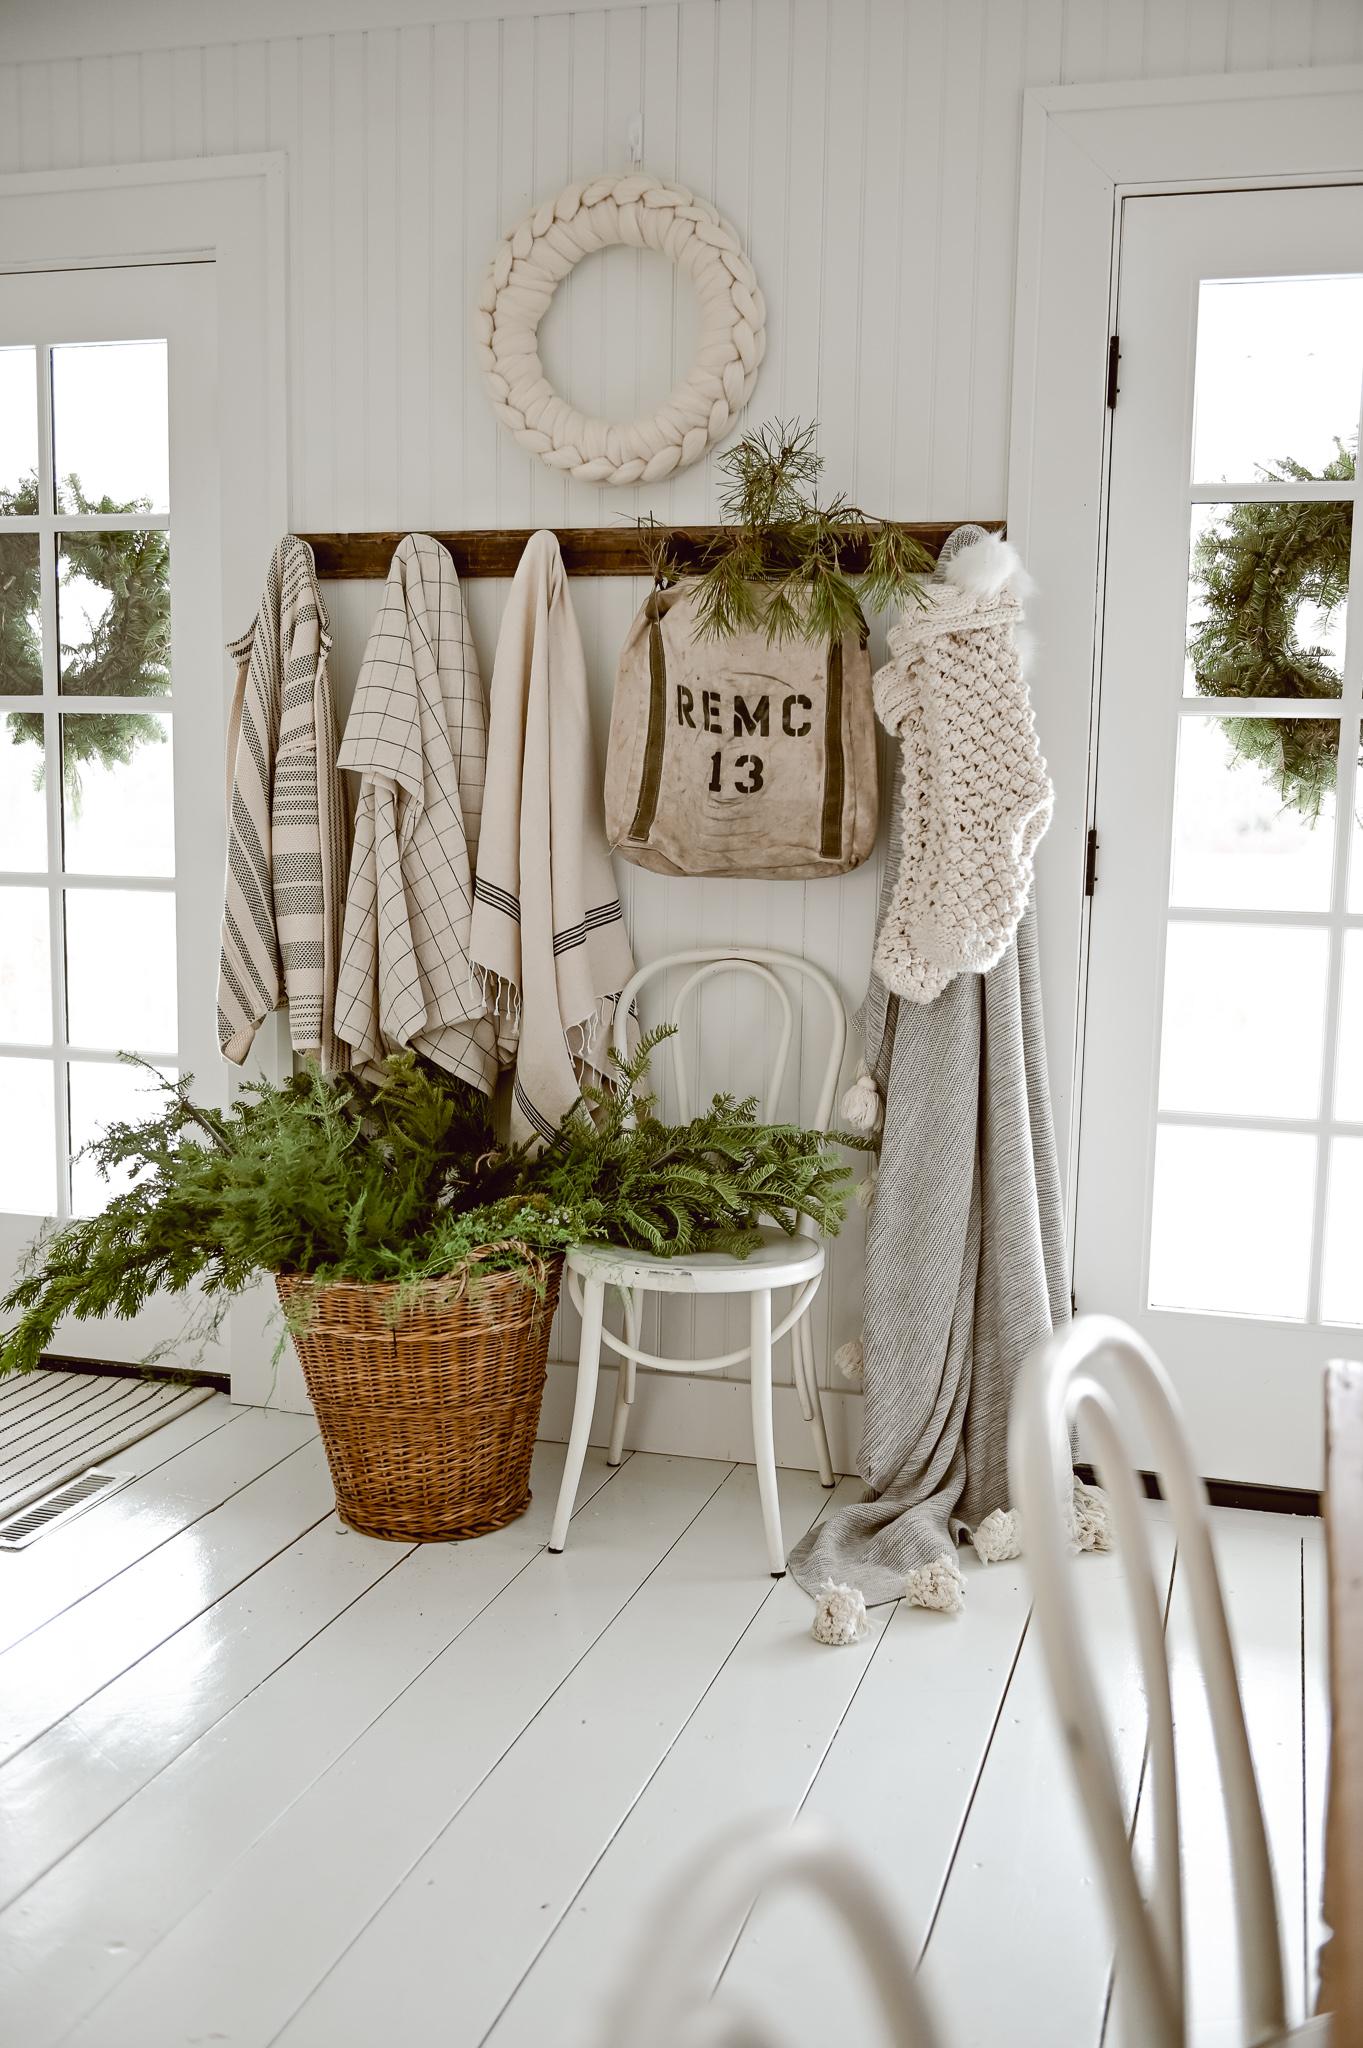 A Cozy Christmas Entryway - Liz Marie Blog Best Children's Lighting & Home Decor Online Store